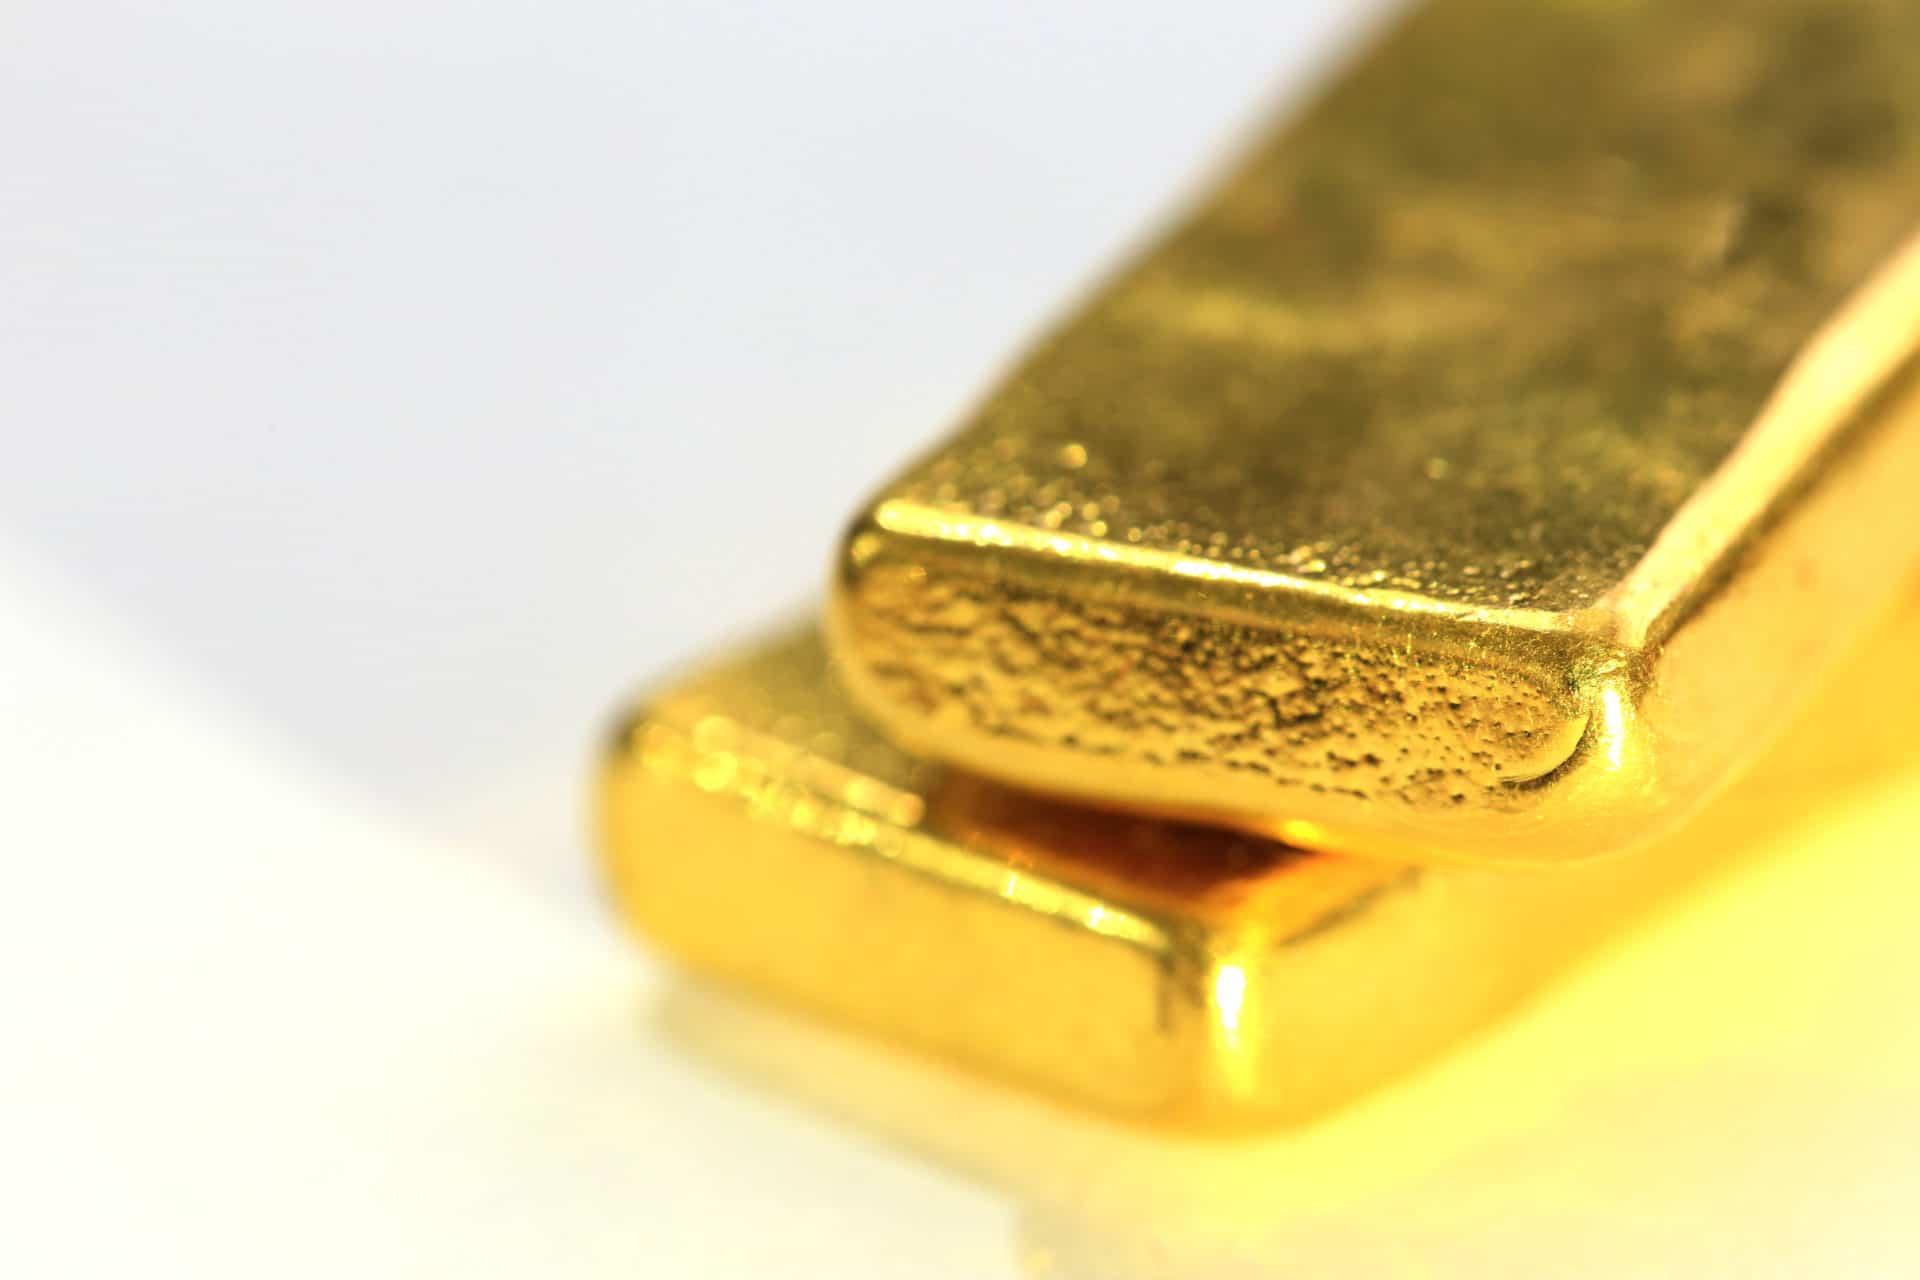 L'or n'a pas dit son dernier mot !